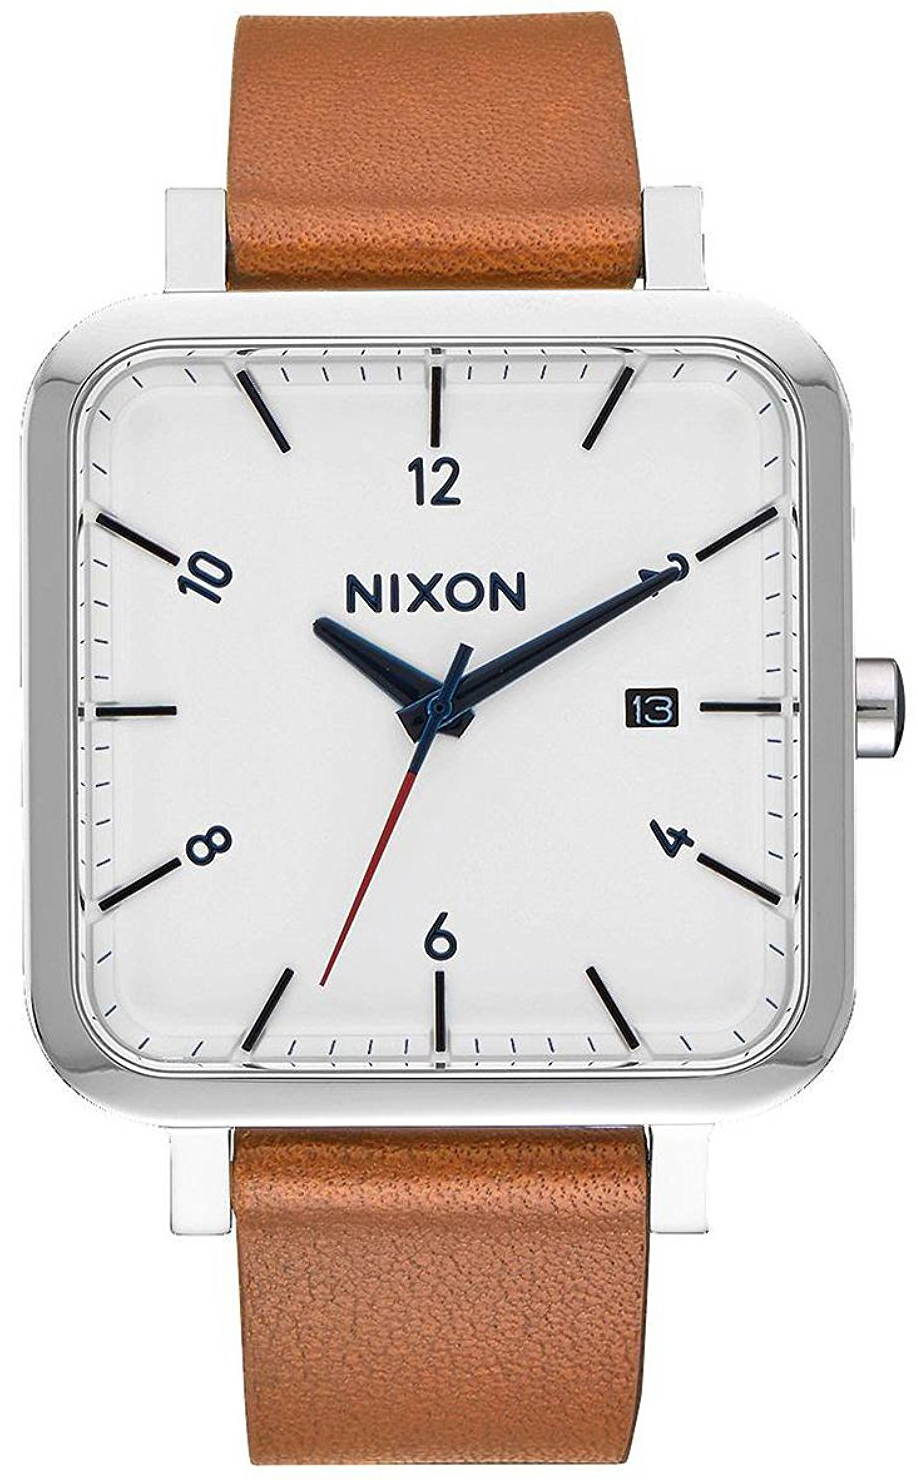 Nixon 99999 Herrklocka A9852312-00 Vit/Läder - Nixon